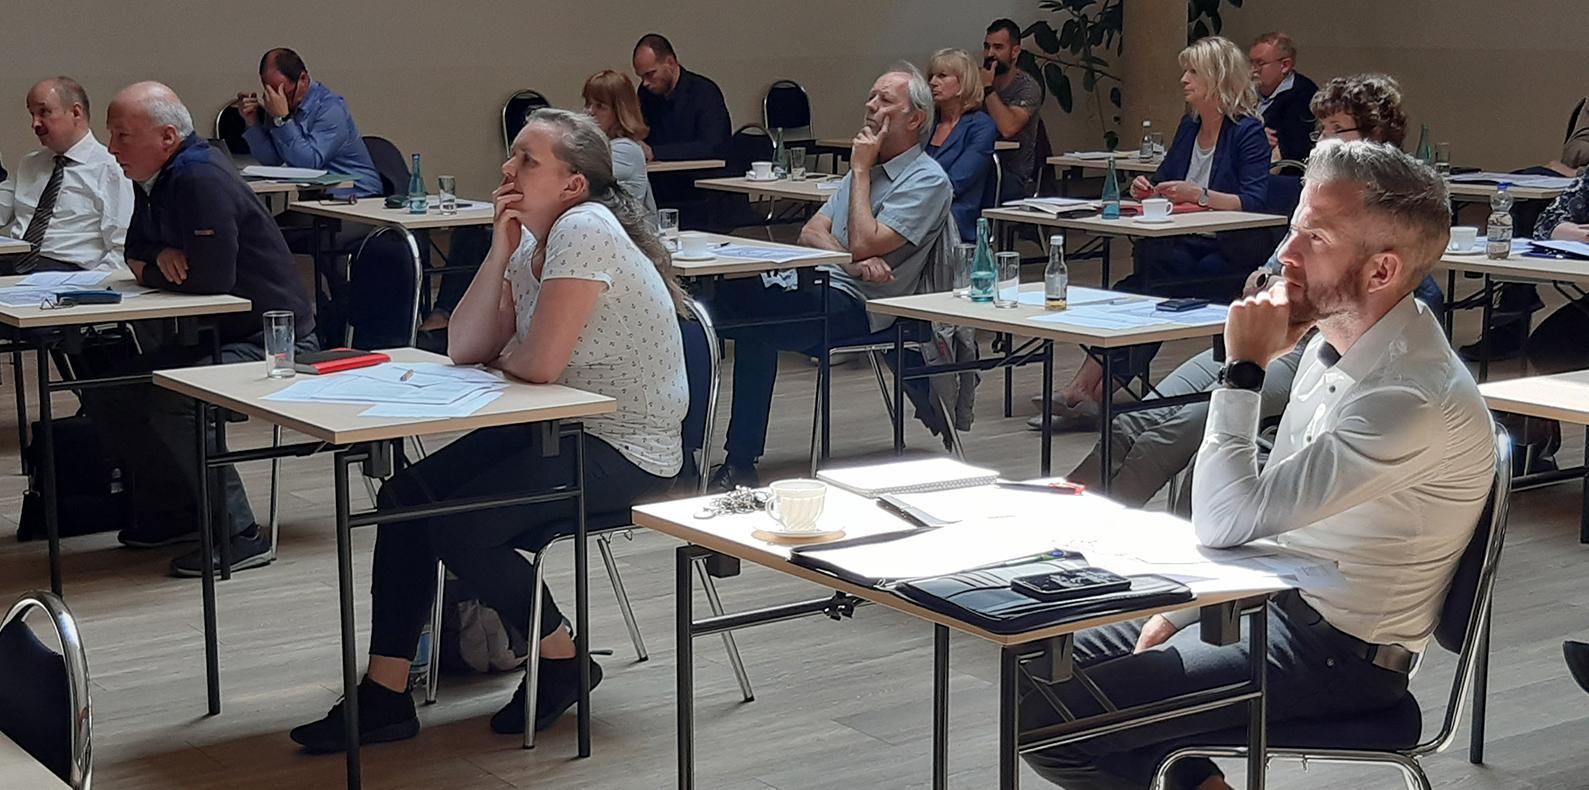 Workshop Blankenfelde-Mahlow